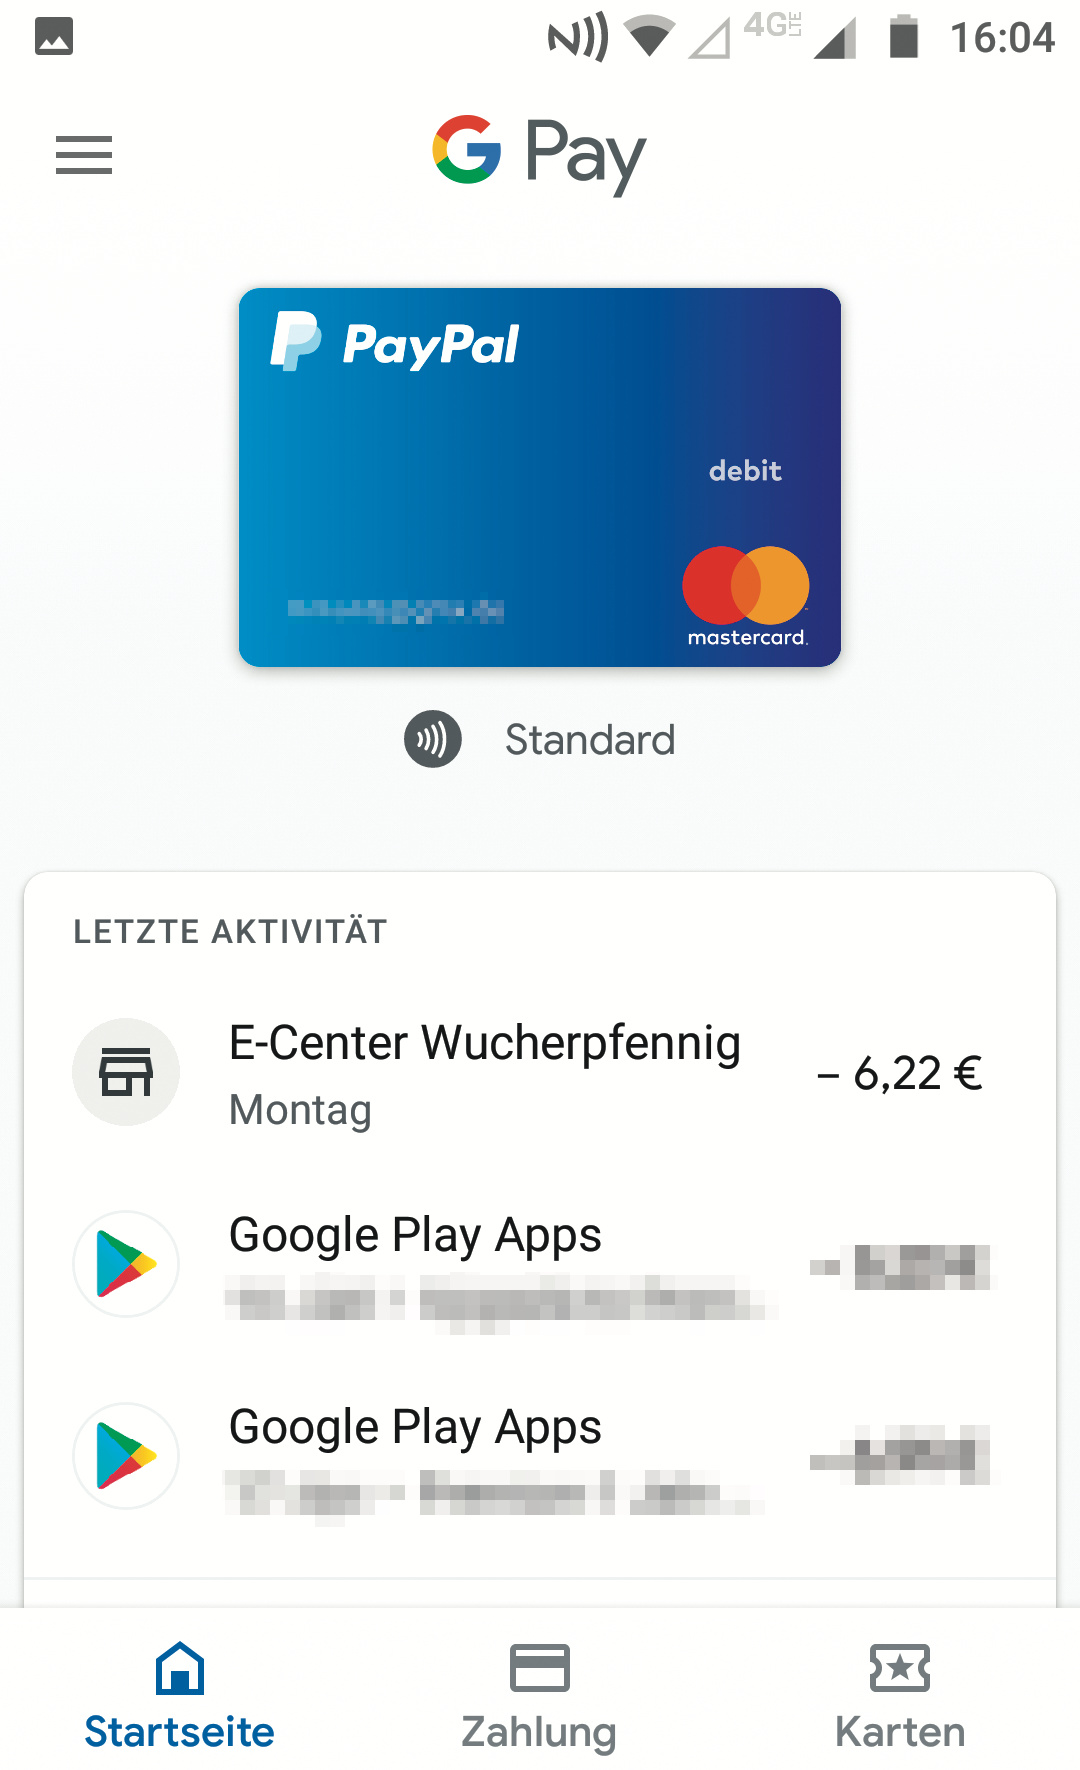 Paypal Karte.Google Pay Kooperiert Mit Paypal C T Heise Magazine